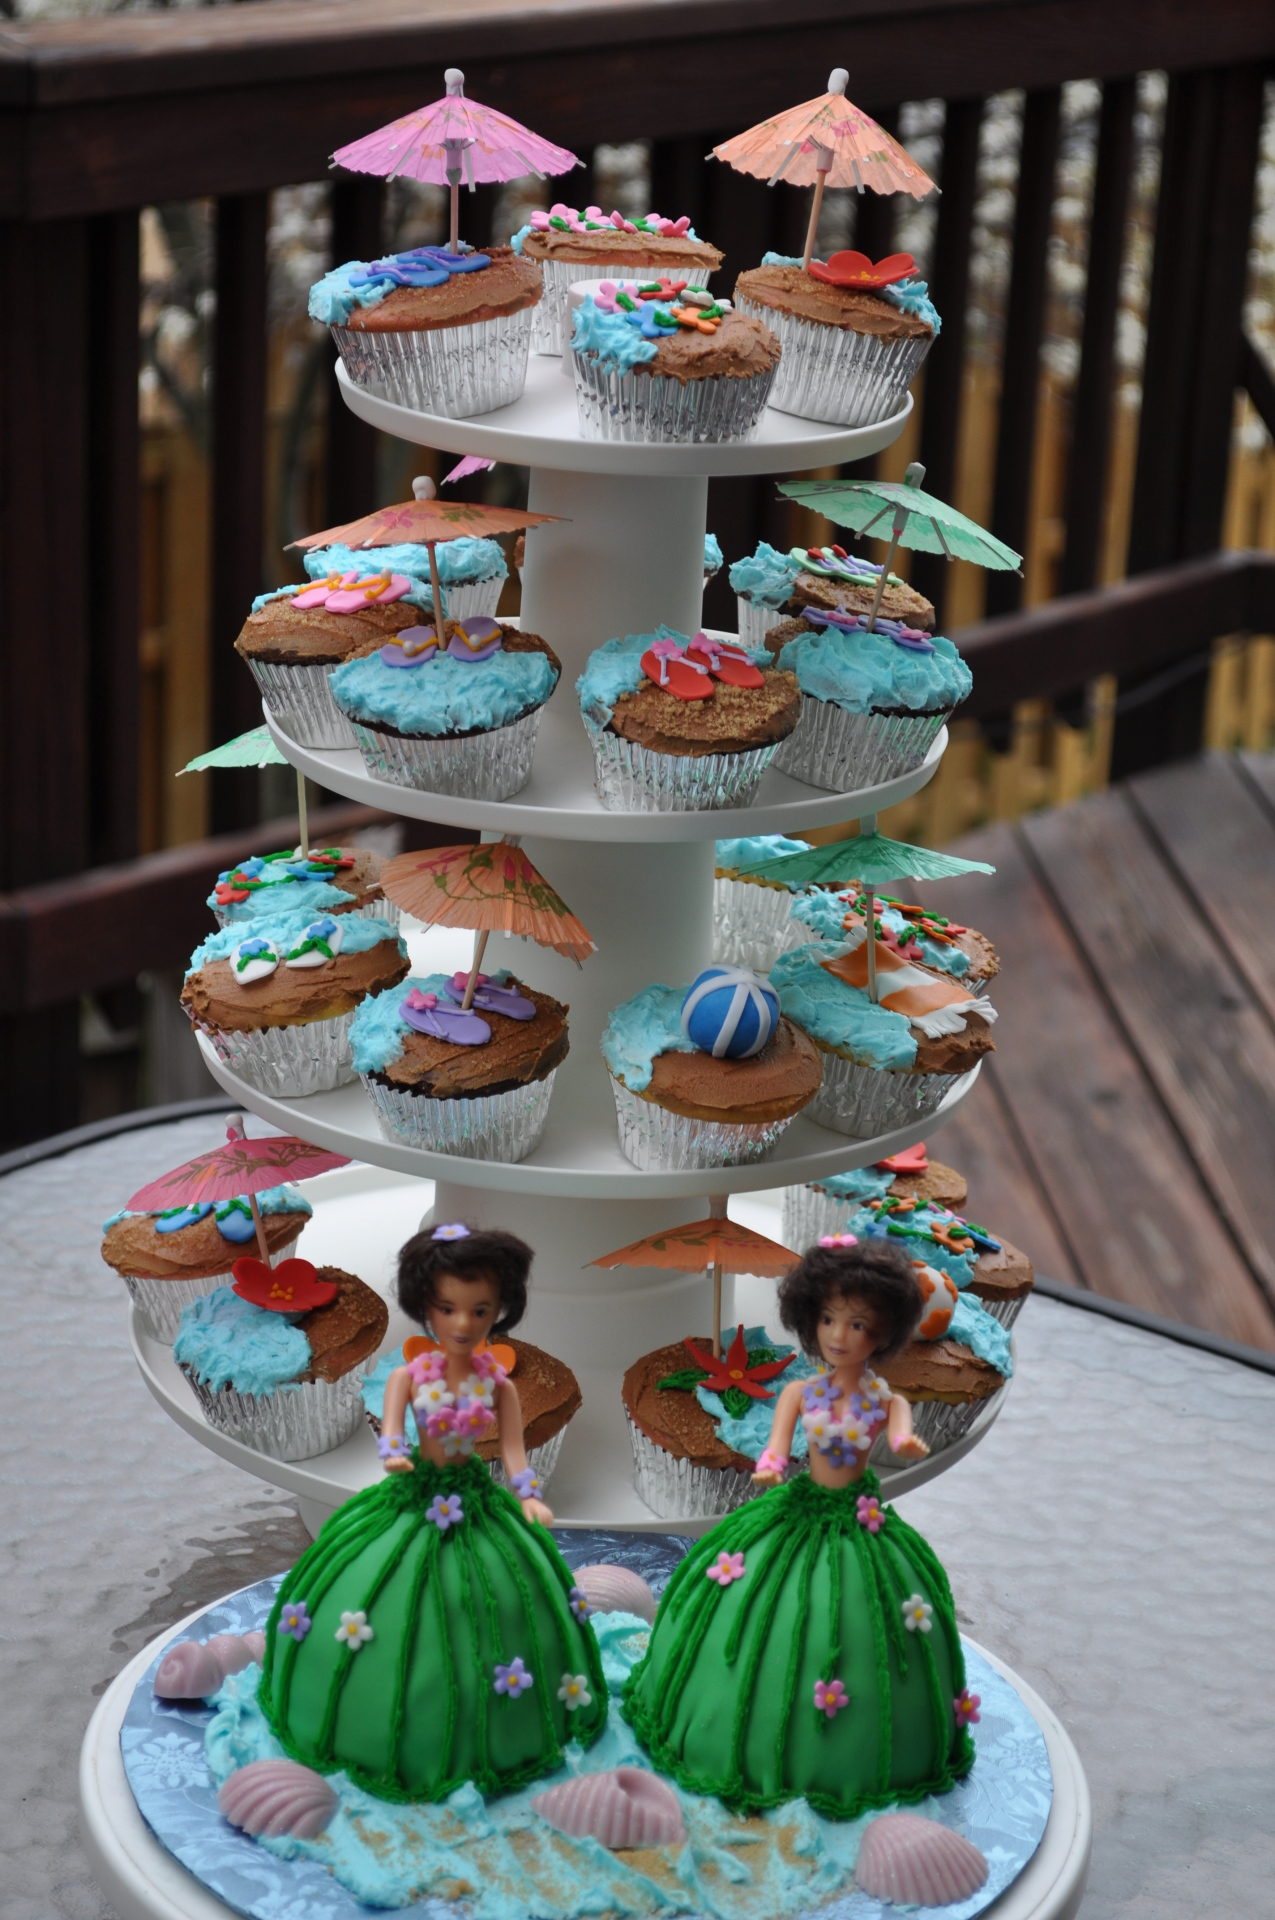 Beach theme cake,Hula doll cake, Hawaiian theme birthday cake,beach cupcakes,umbrella cupcakes